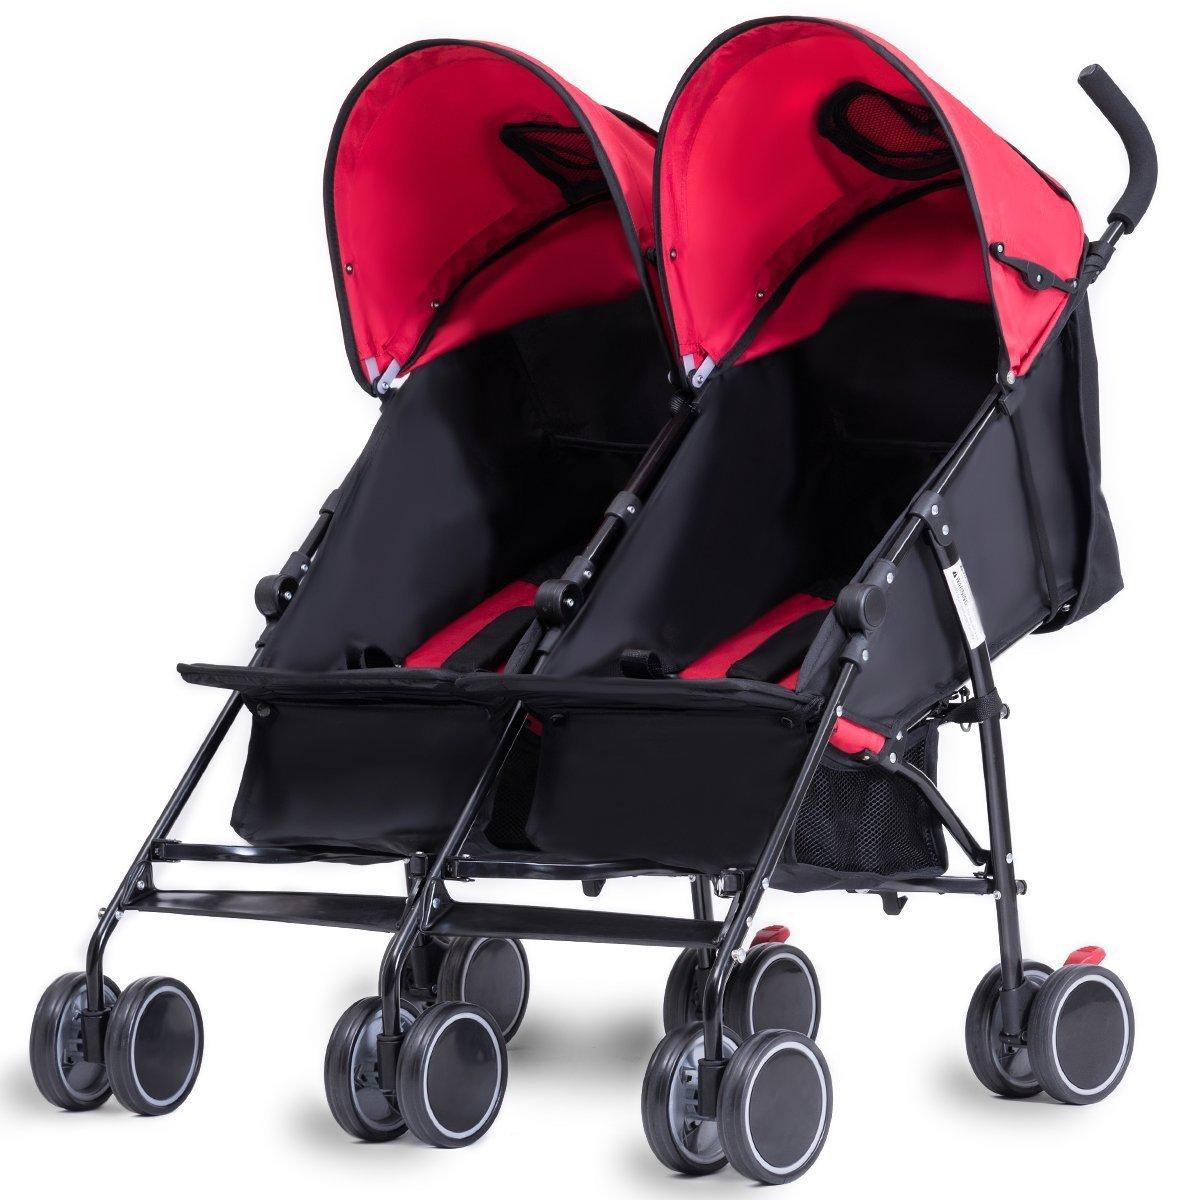 Costzon Twin Ultralight Stroller, Foldable Double Umbrella Stroller (Scarlet)